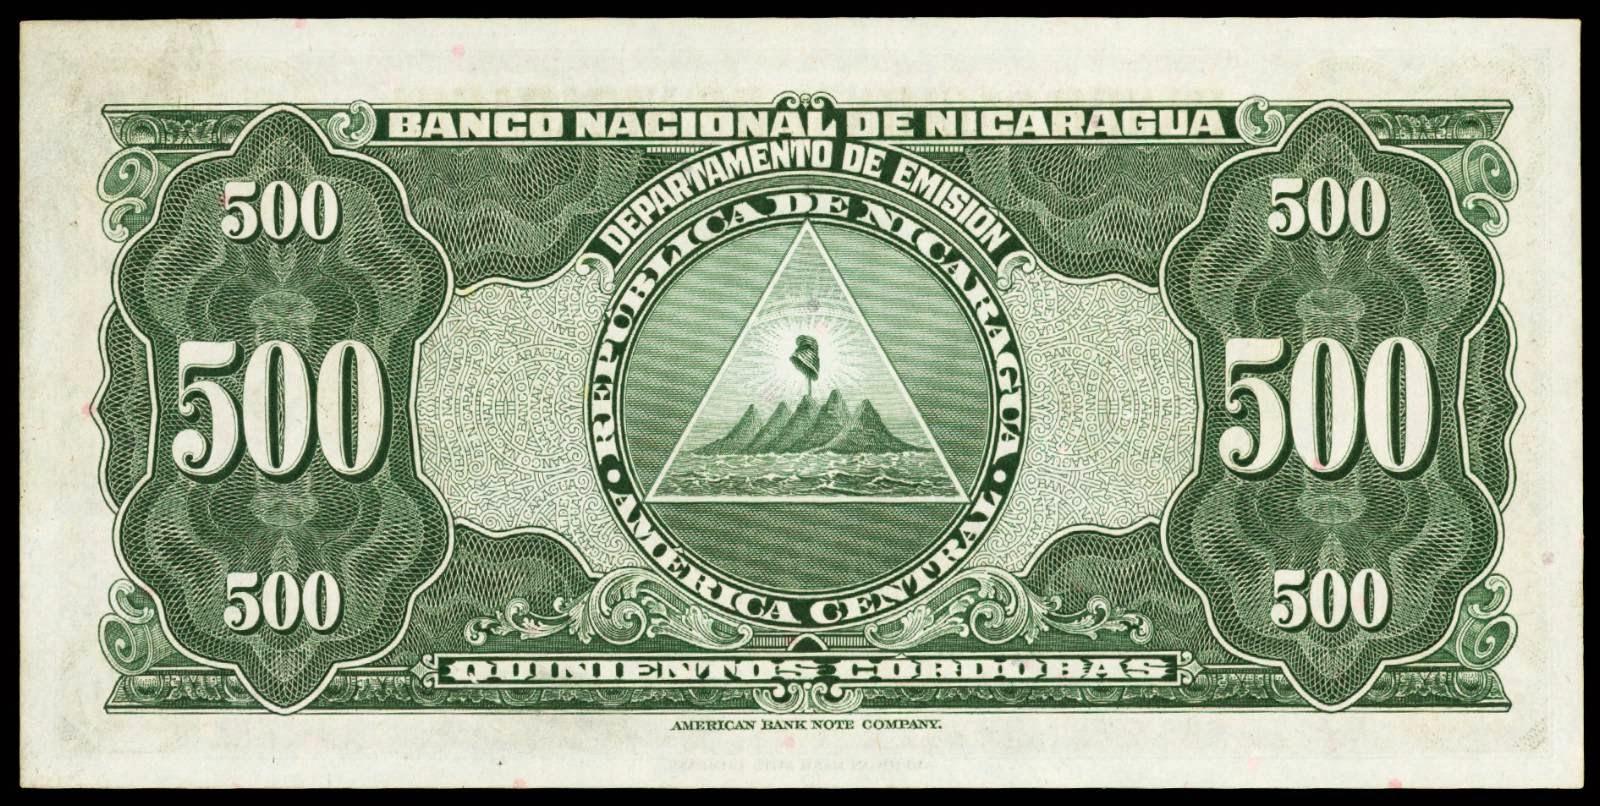 Nicaragua banknotes 500 Cordobas 1945 Coat of arms of Nicaragua